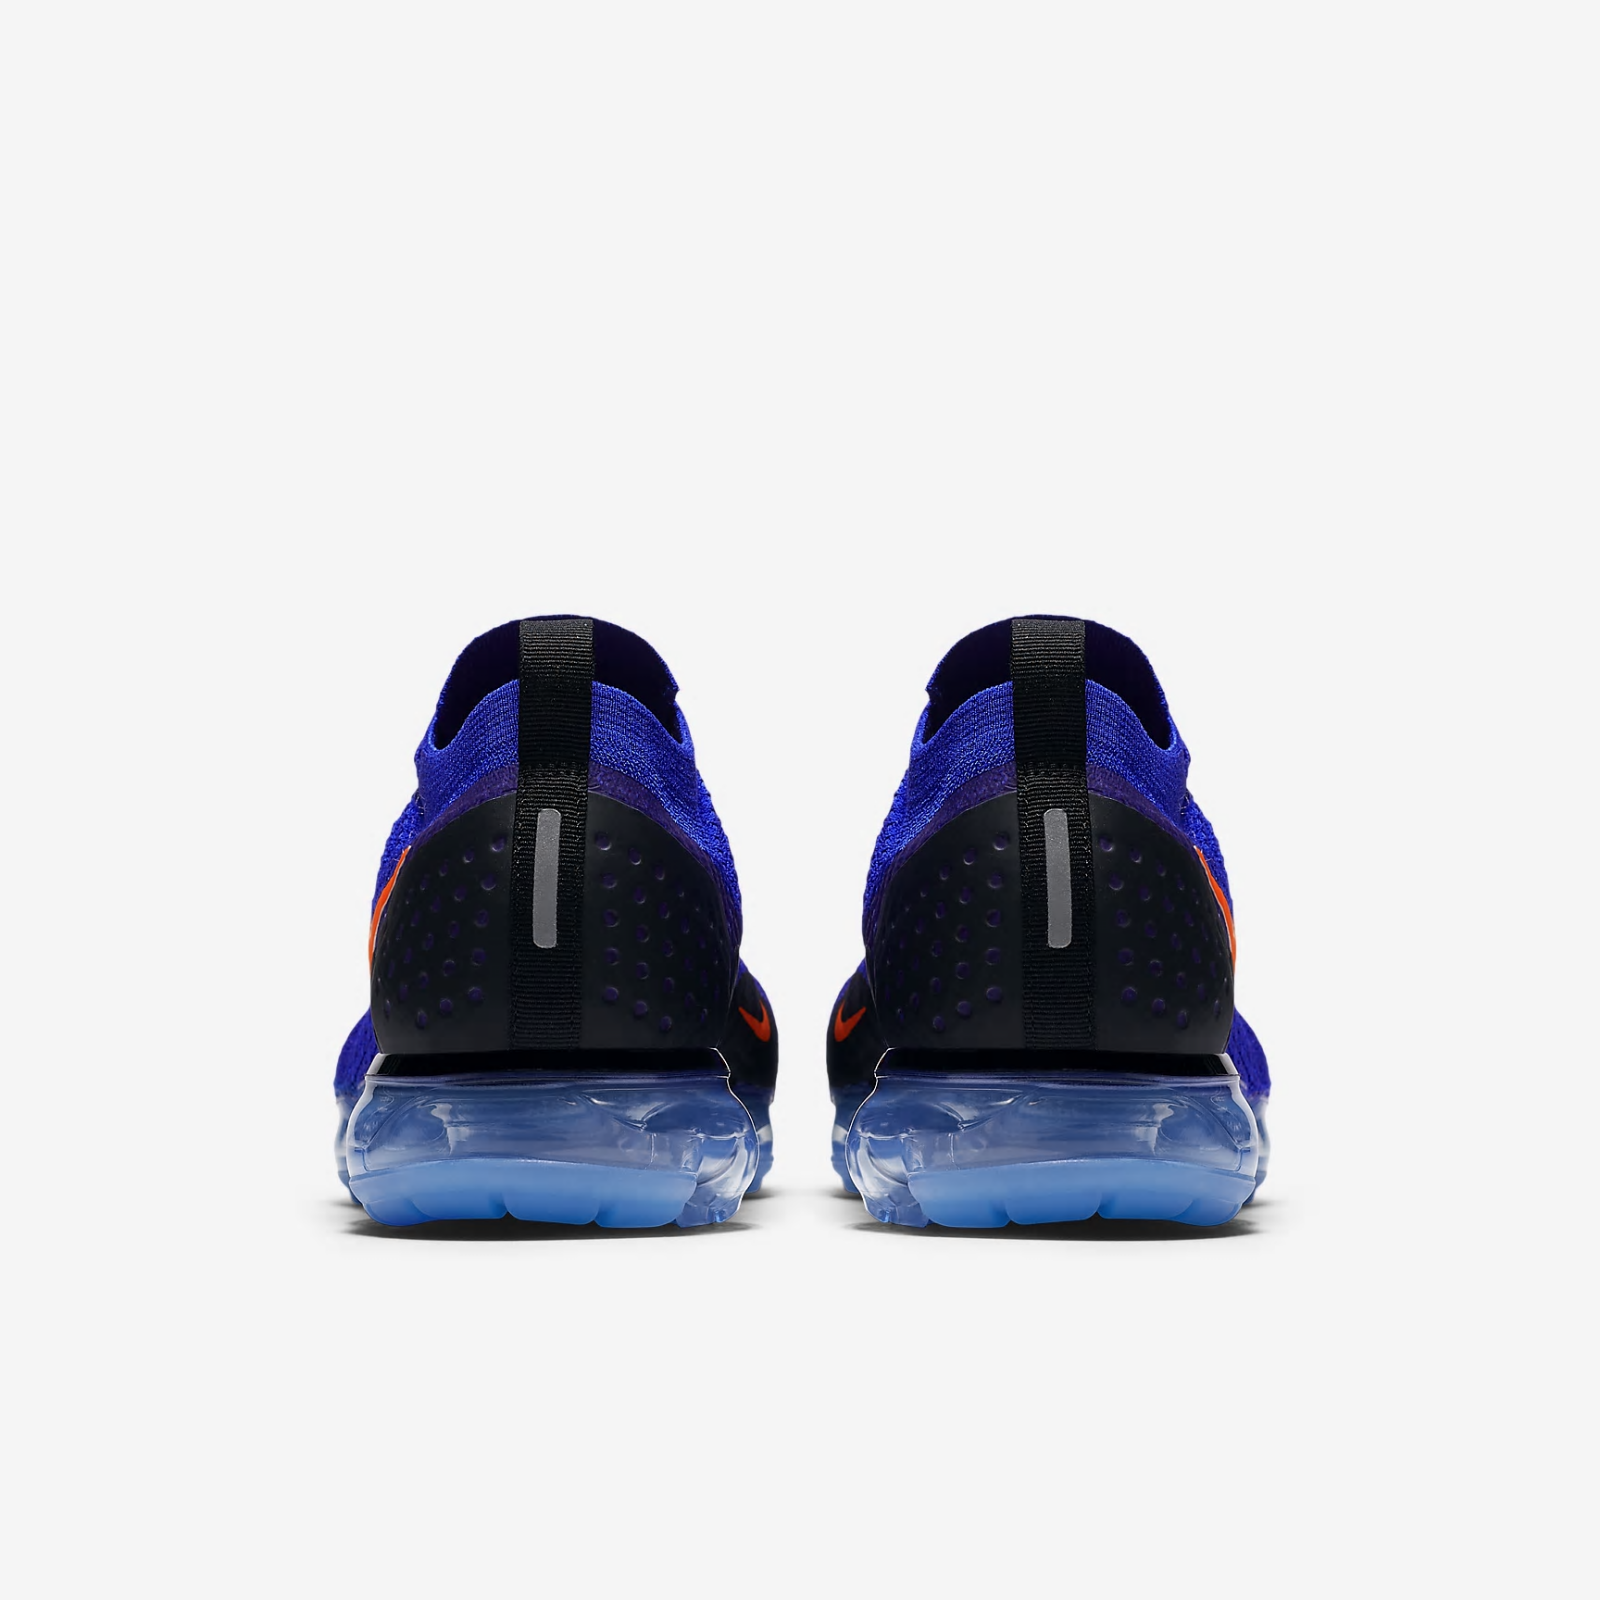 best website d8b9f 0cdf2 Men s Authentic Nike Air Vapor Max Flyknit 2 Shoes Sizes ...